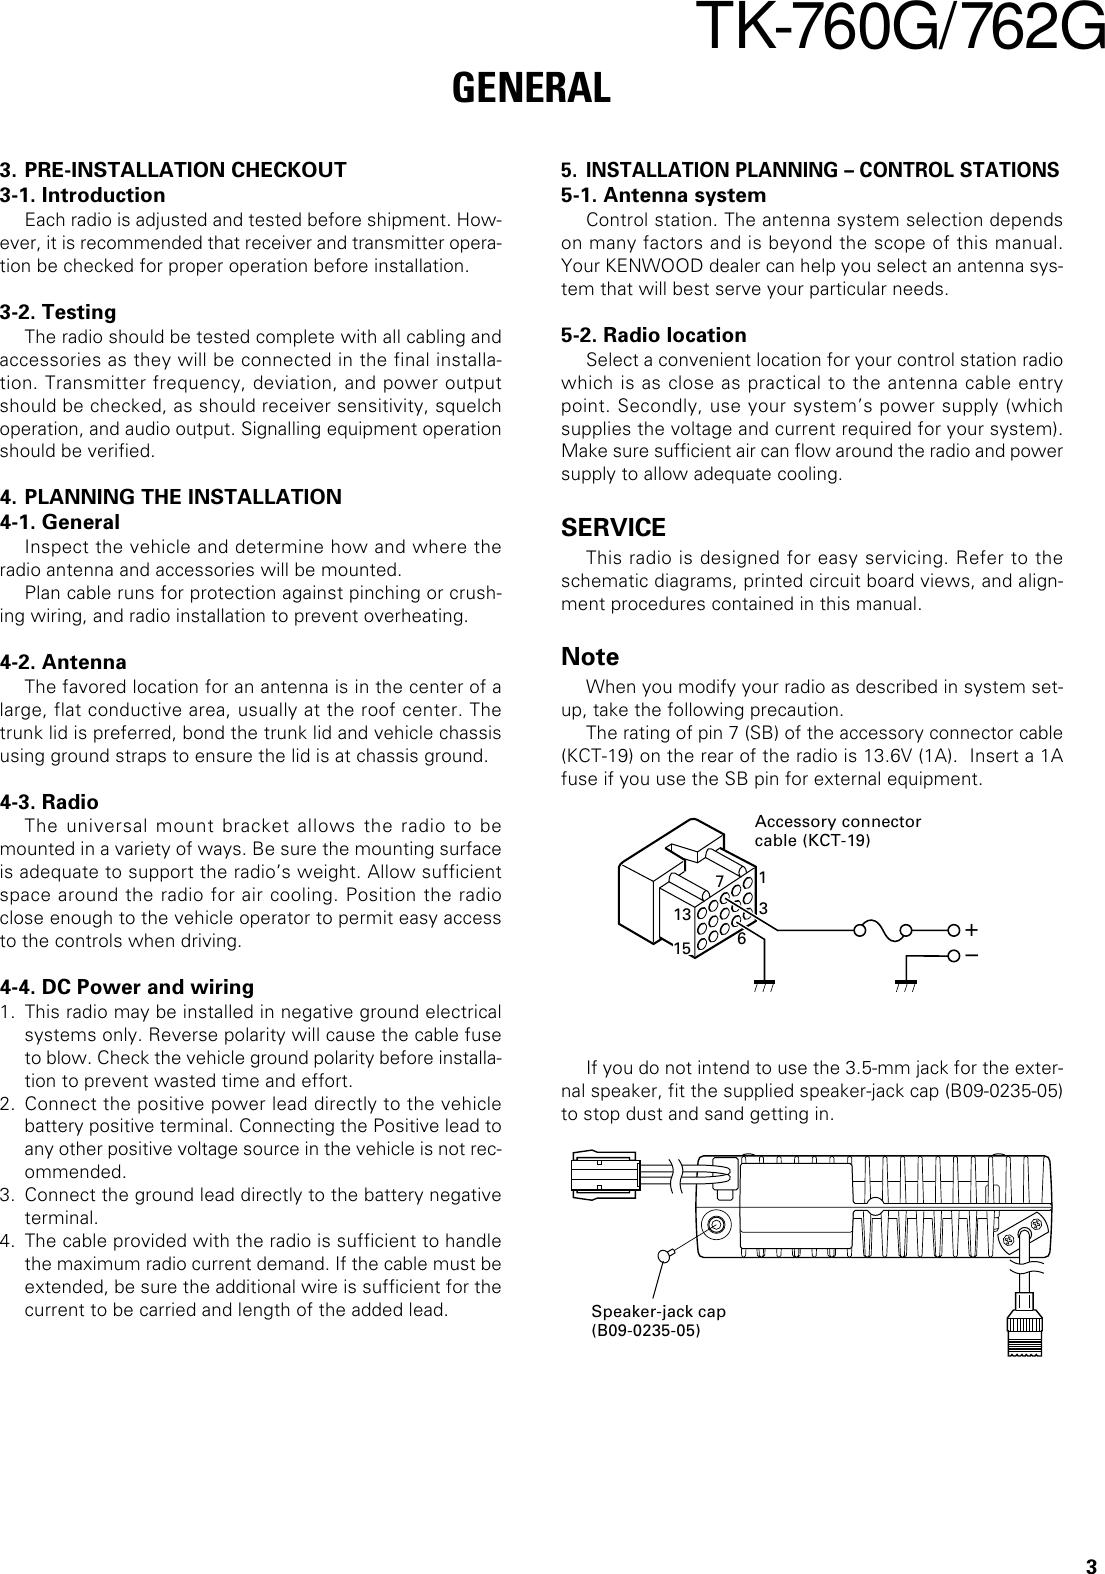 Kenwood Marine Radio 762G Users Manual 1~10